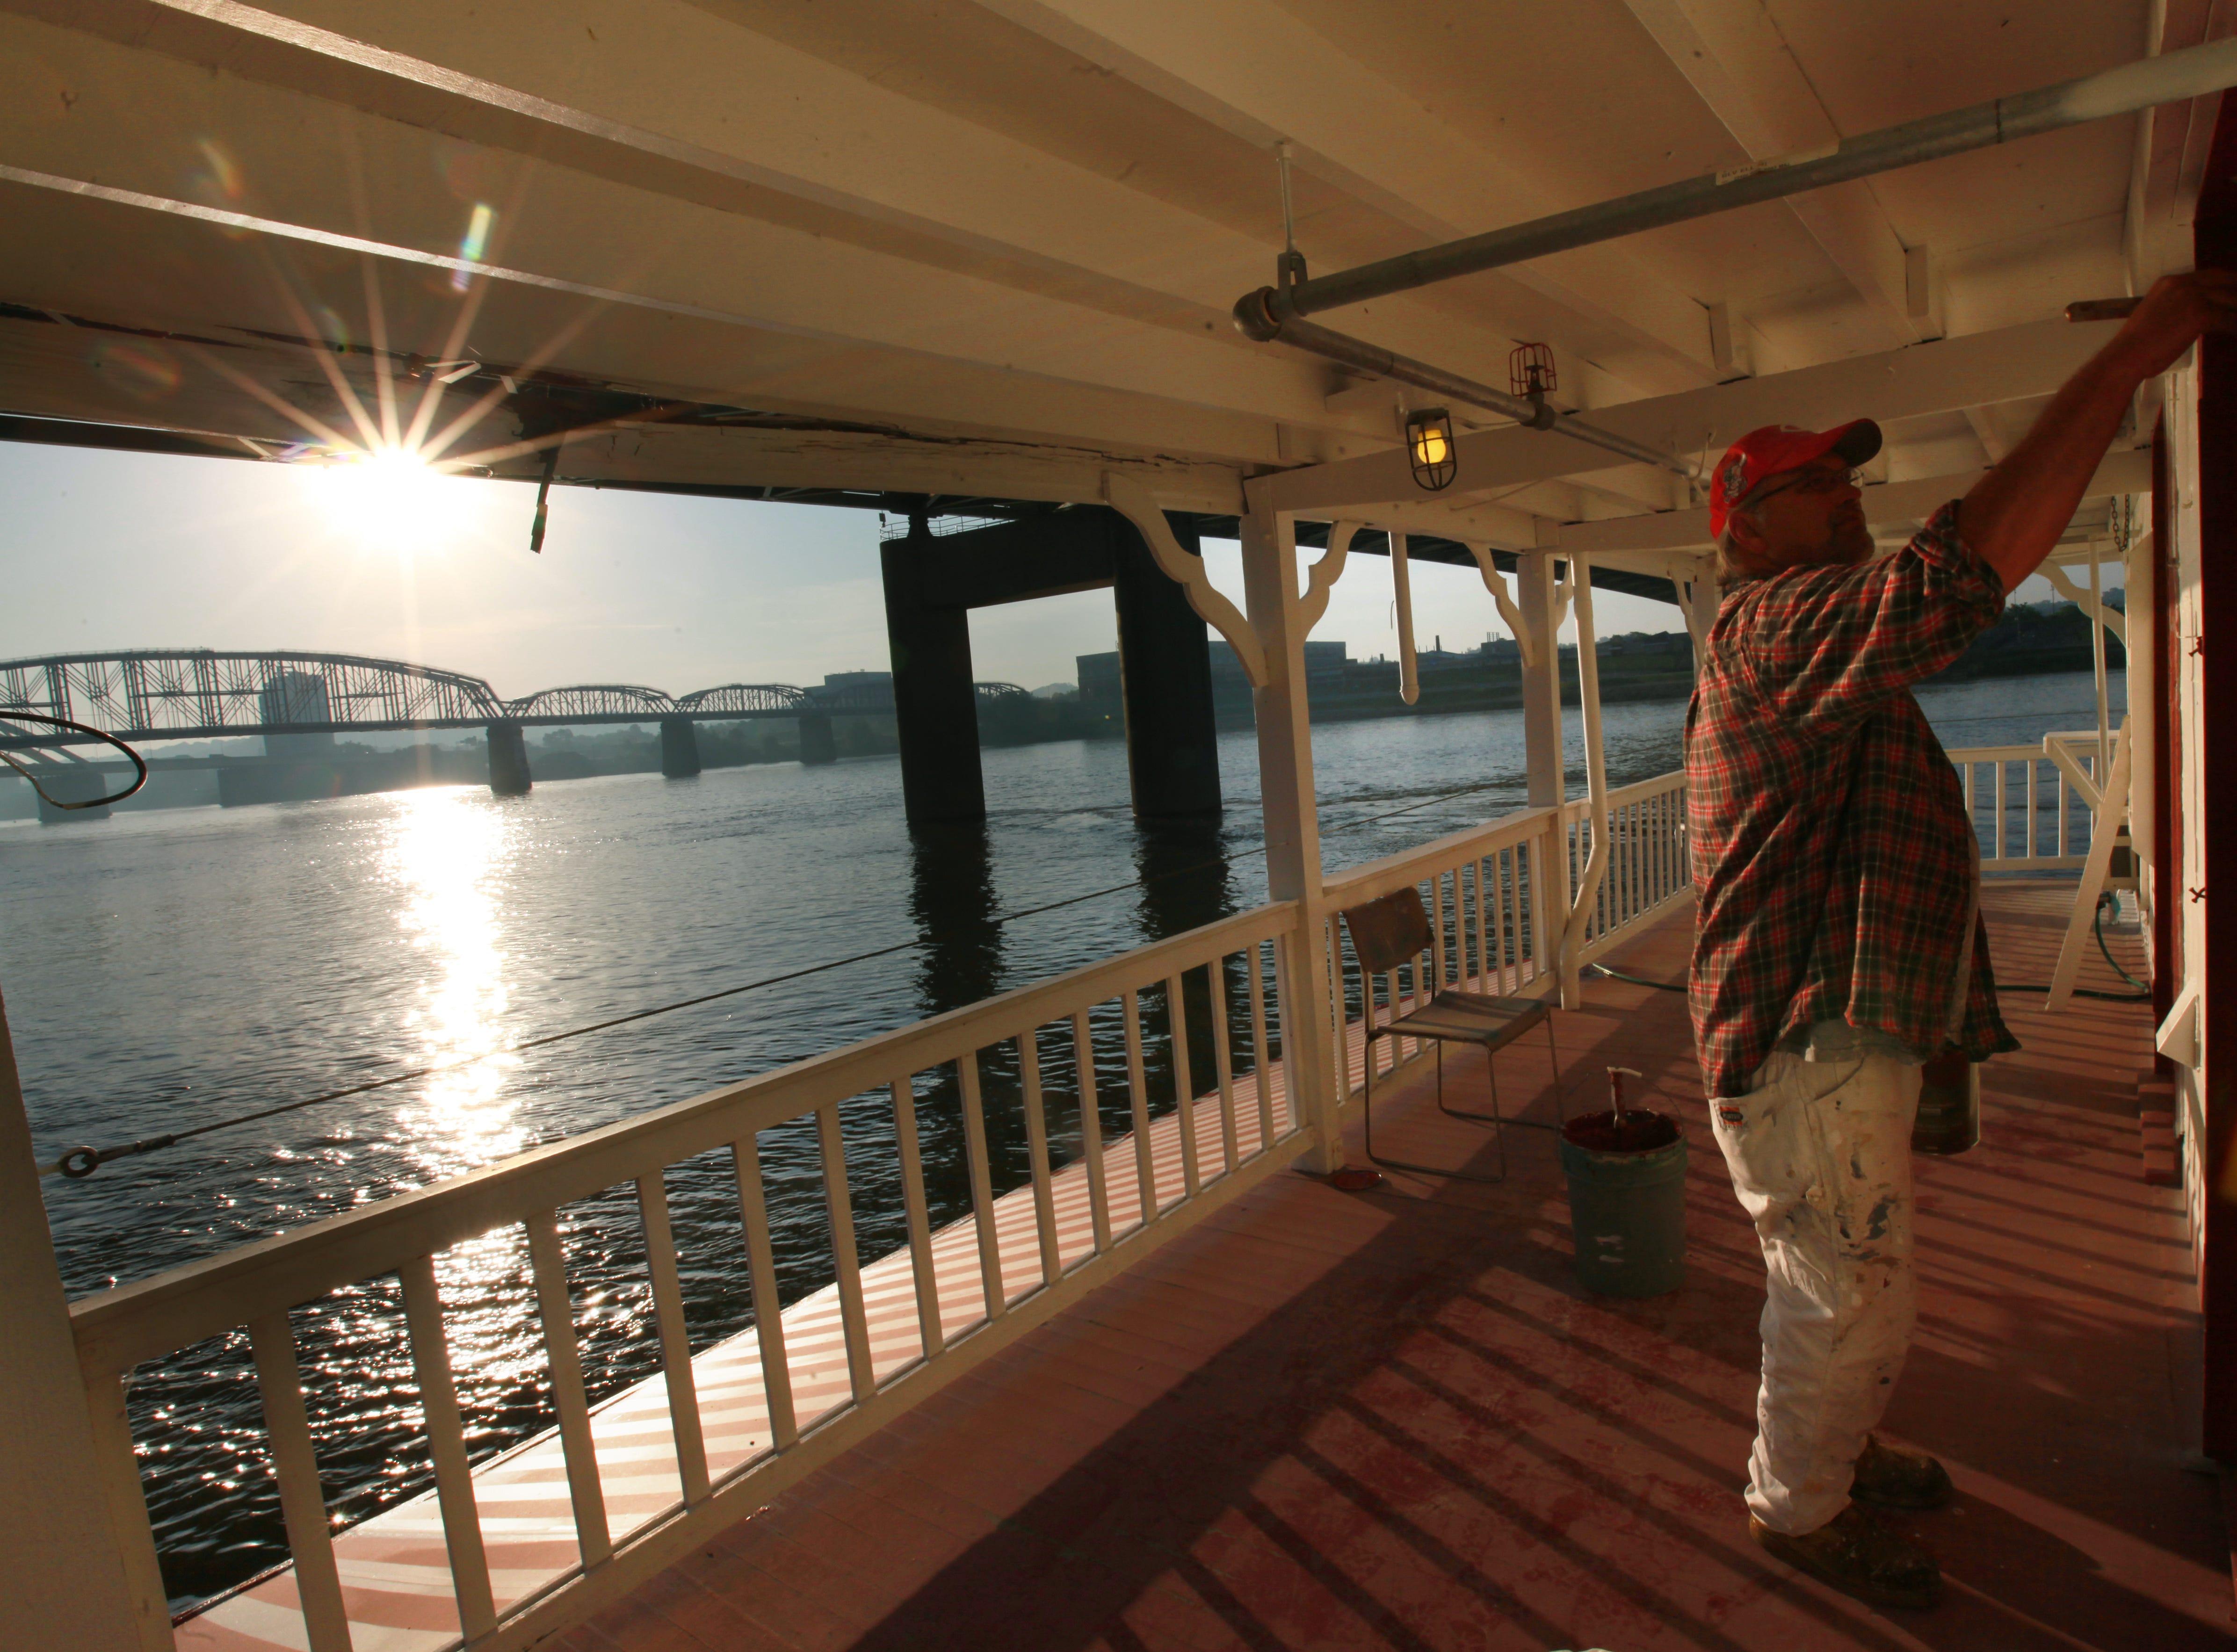 Ron Morgan of Unique Construction paints the Showboat Majestic in 2012.